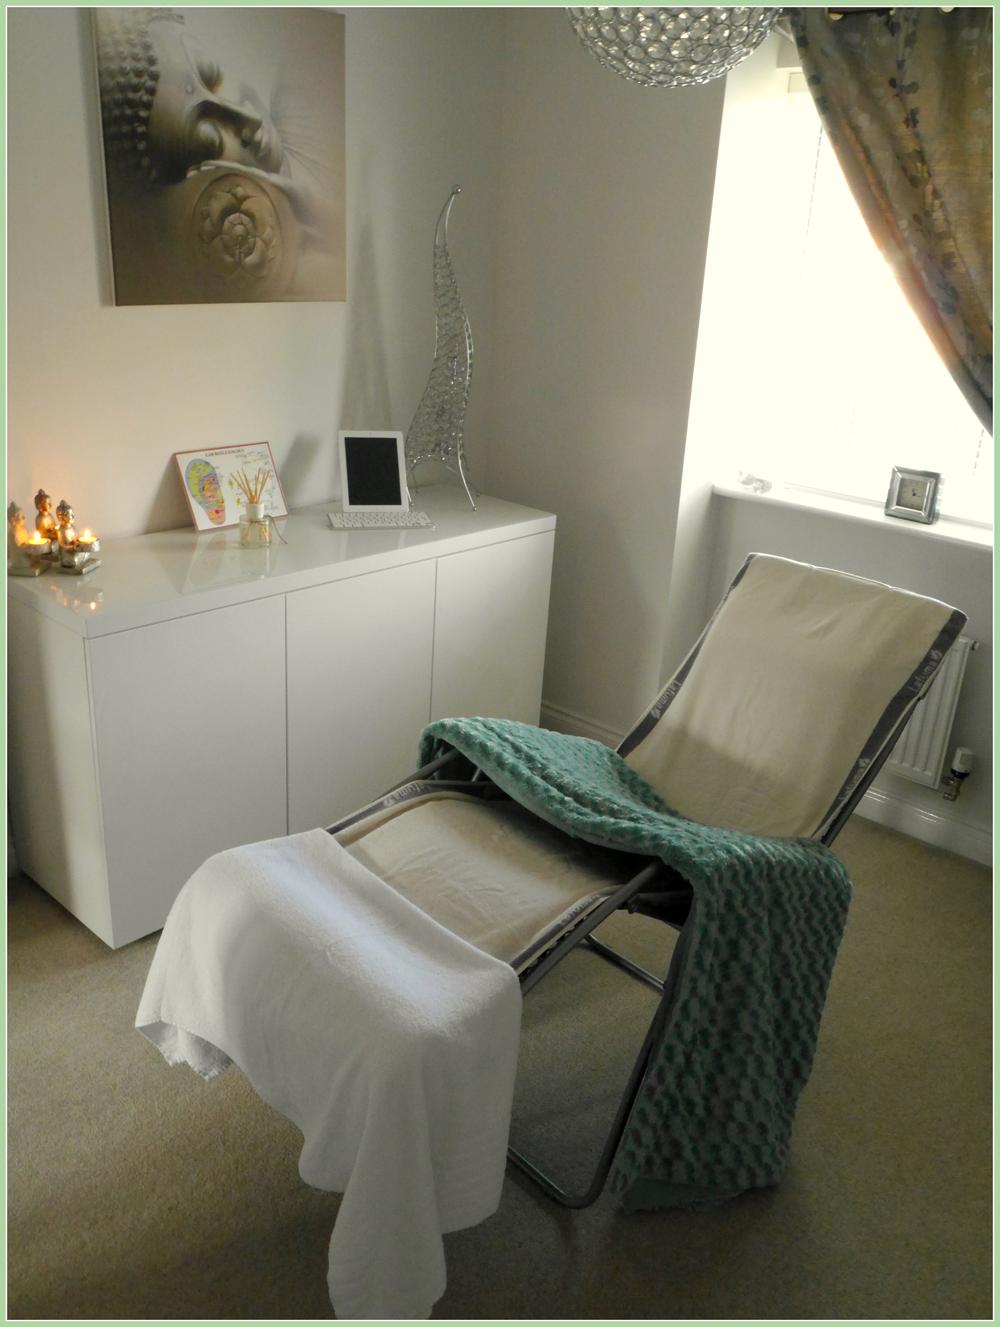 Room Ideas: Reflexology Treatment Room Ideas - Google Search